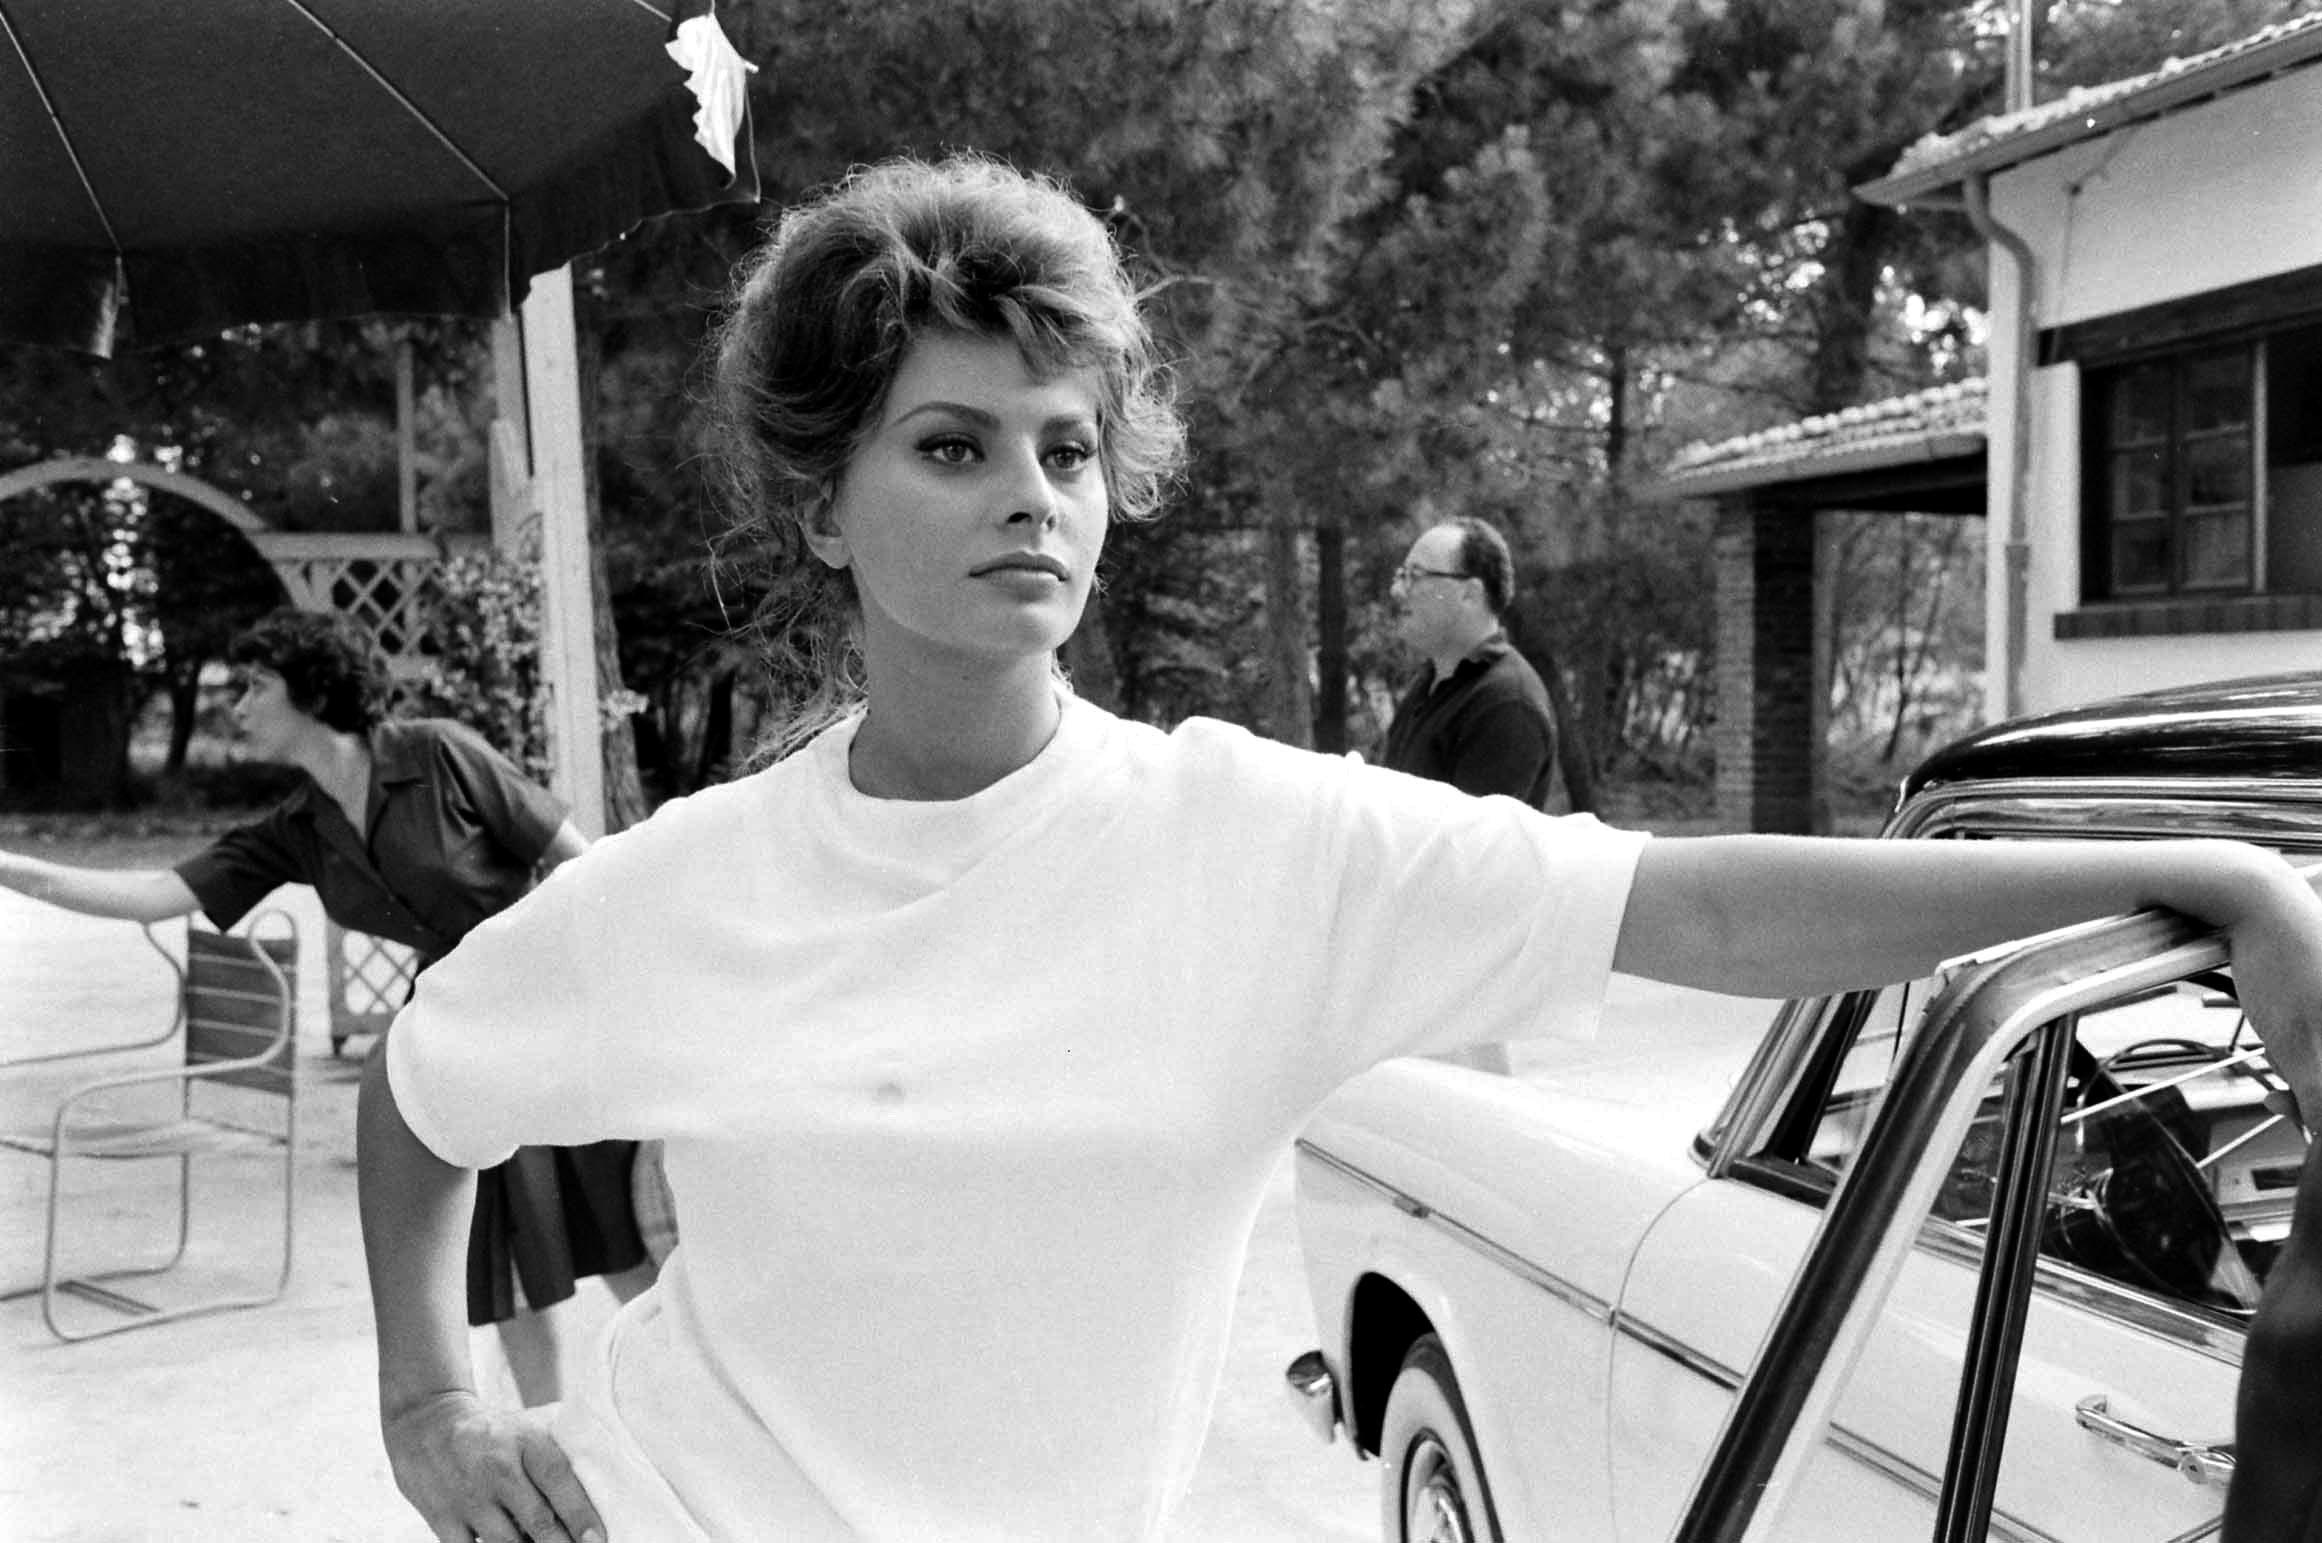 Sophia Loren Rare And Classic Photos Of A Movie Legend